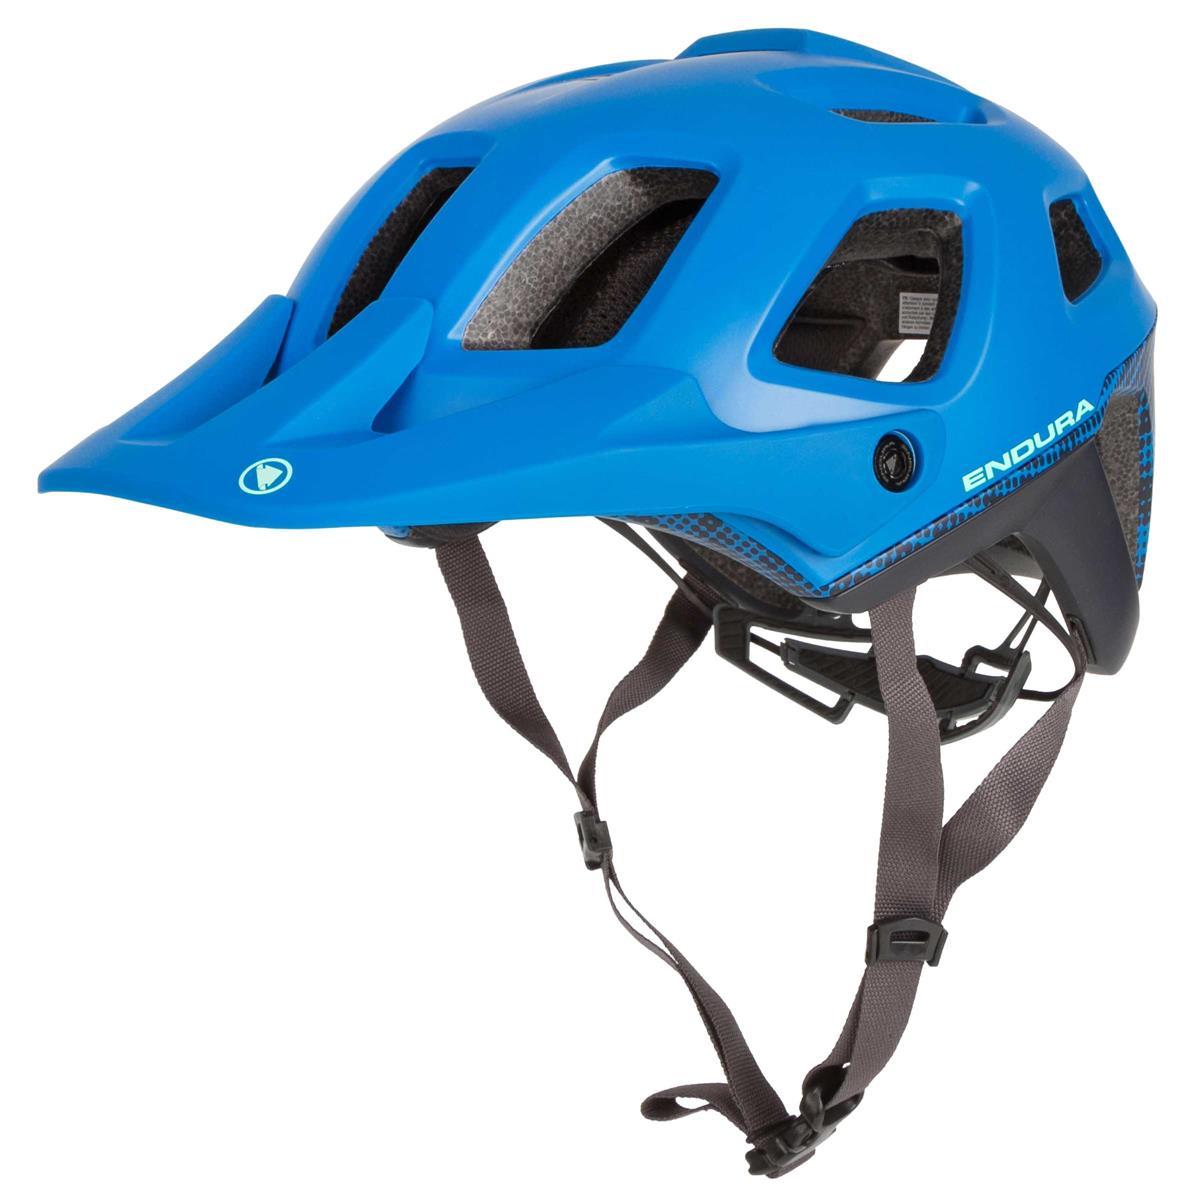 Endura singletrack helmet sizing